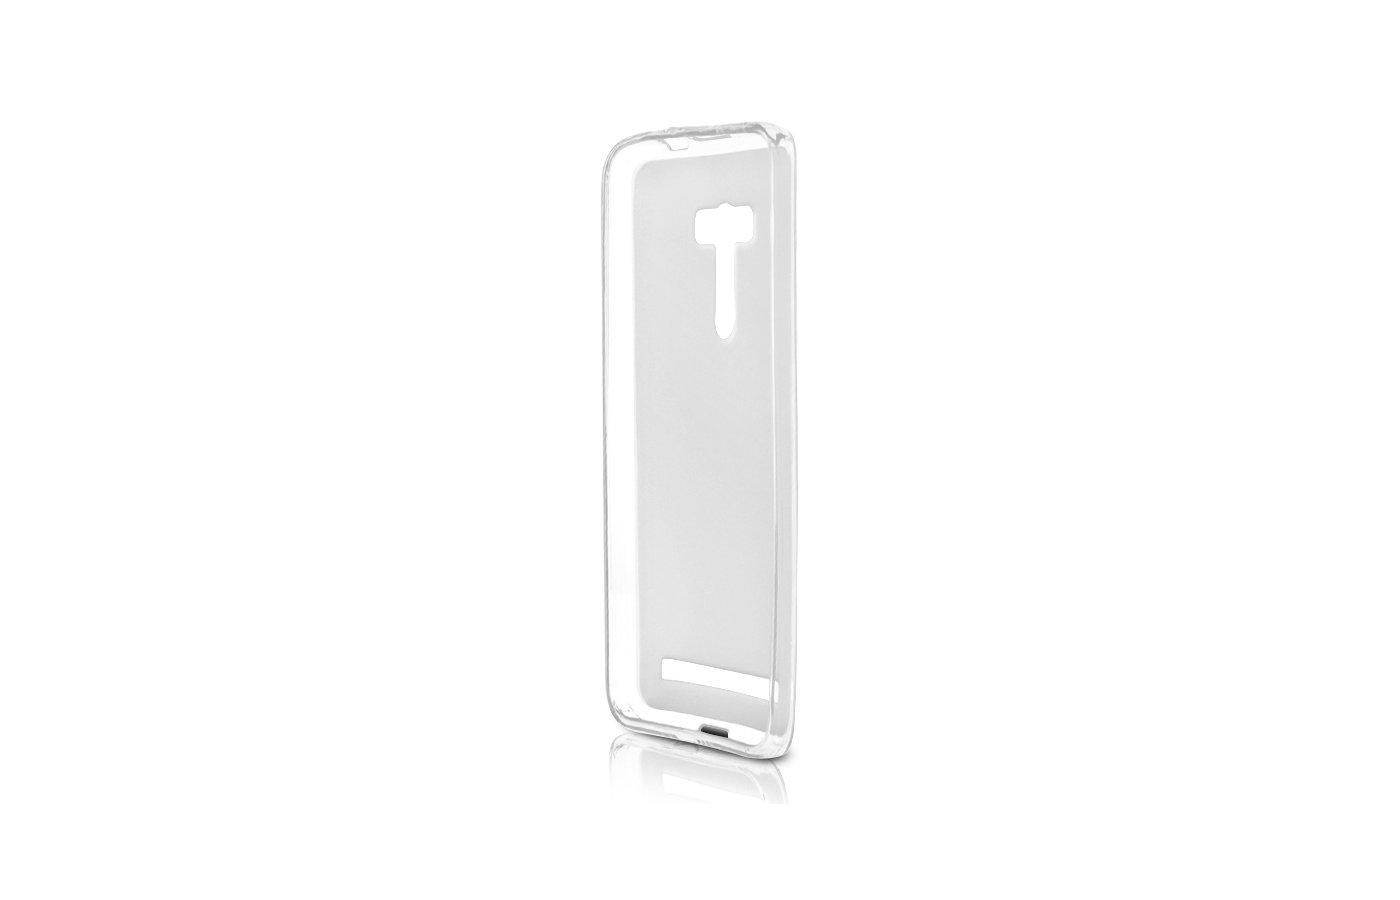 Чехол DF для Asus ZenFone Selfie (ZD551KL) aCase-03